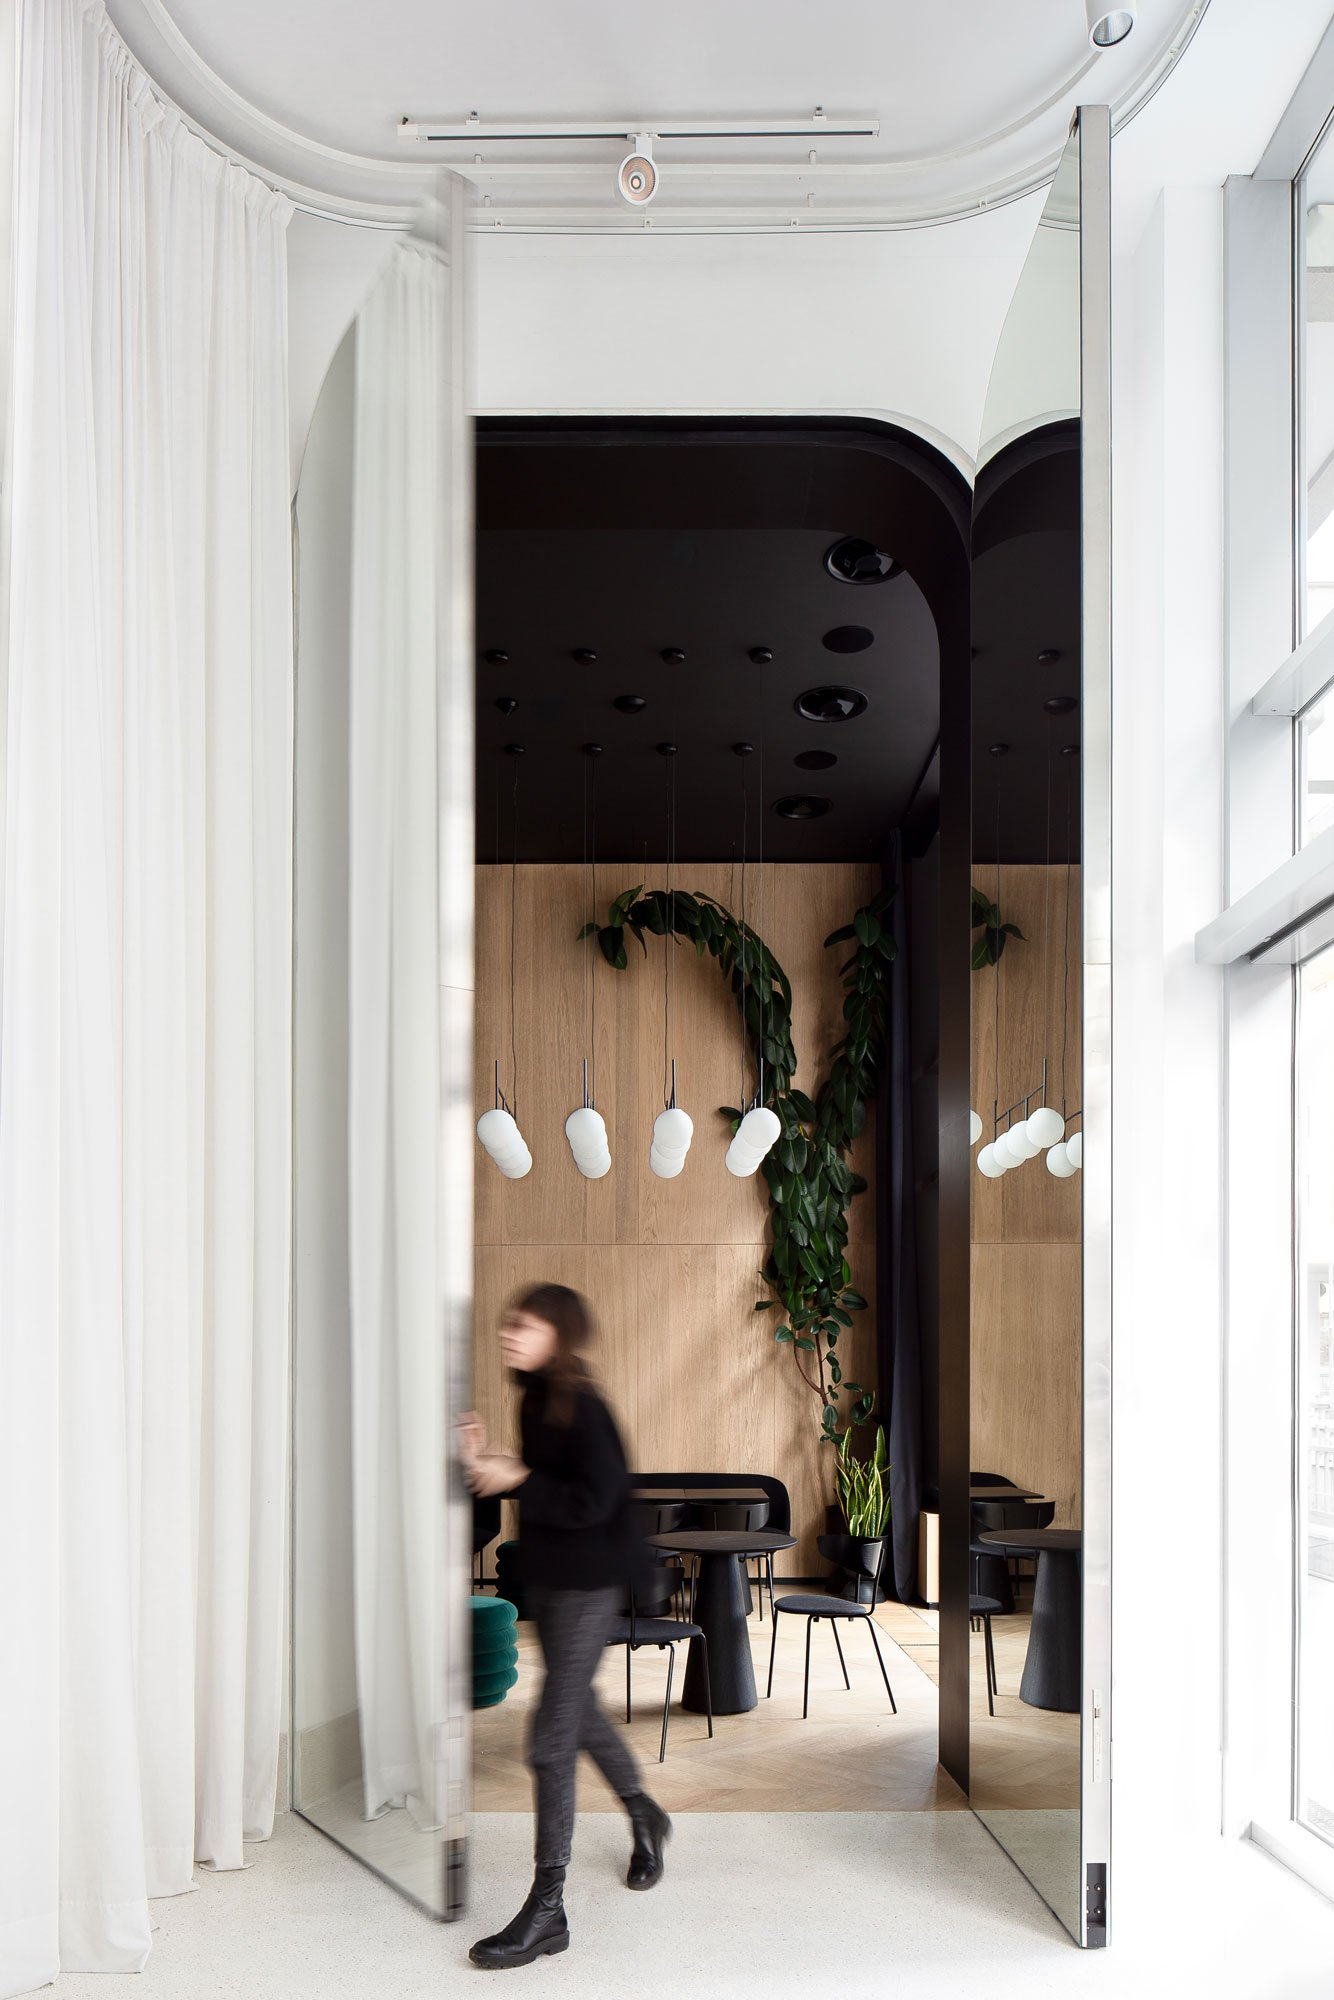 GIR Café von AUTORI in Belgrad